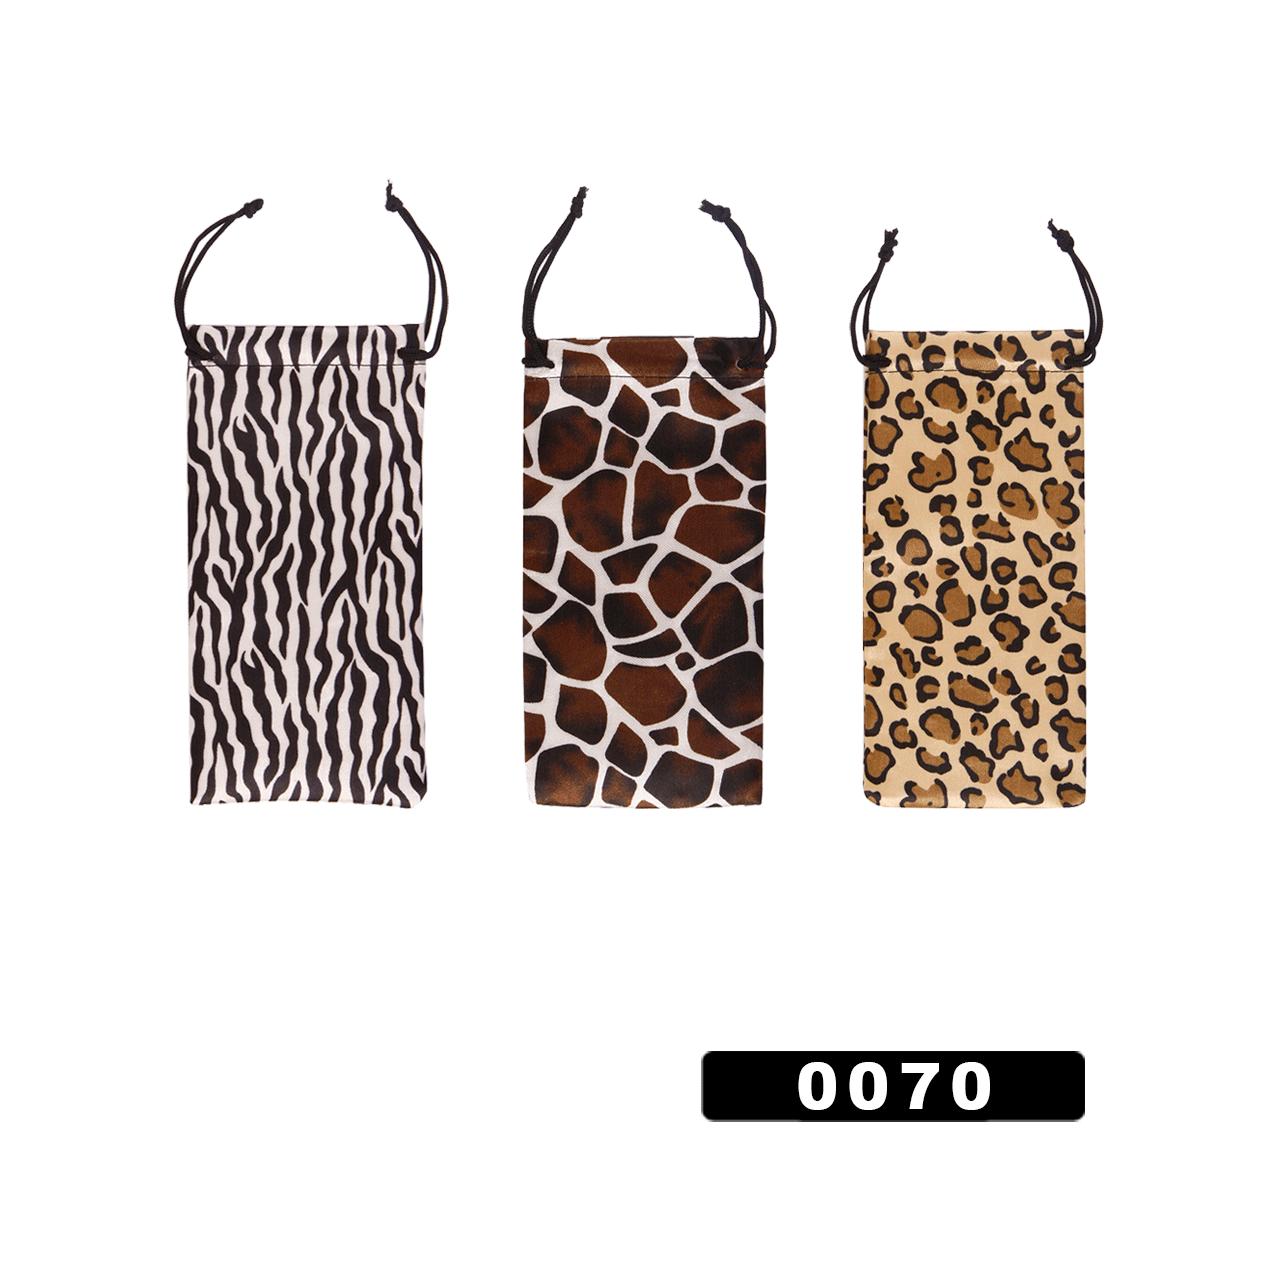 Sunglass Draw String Bags #0070 - Animal Print!